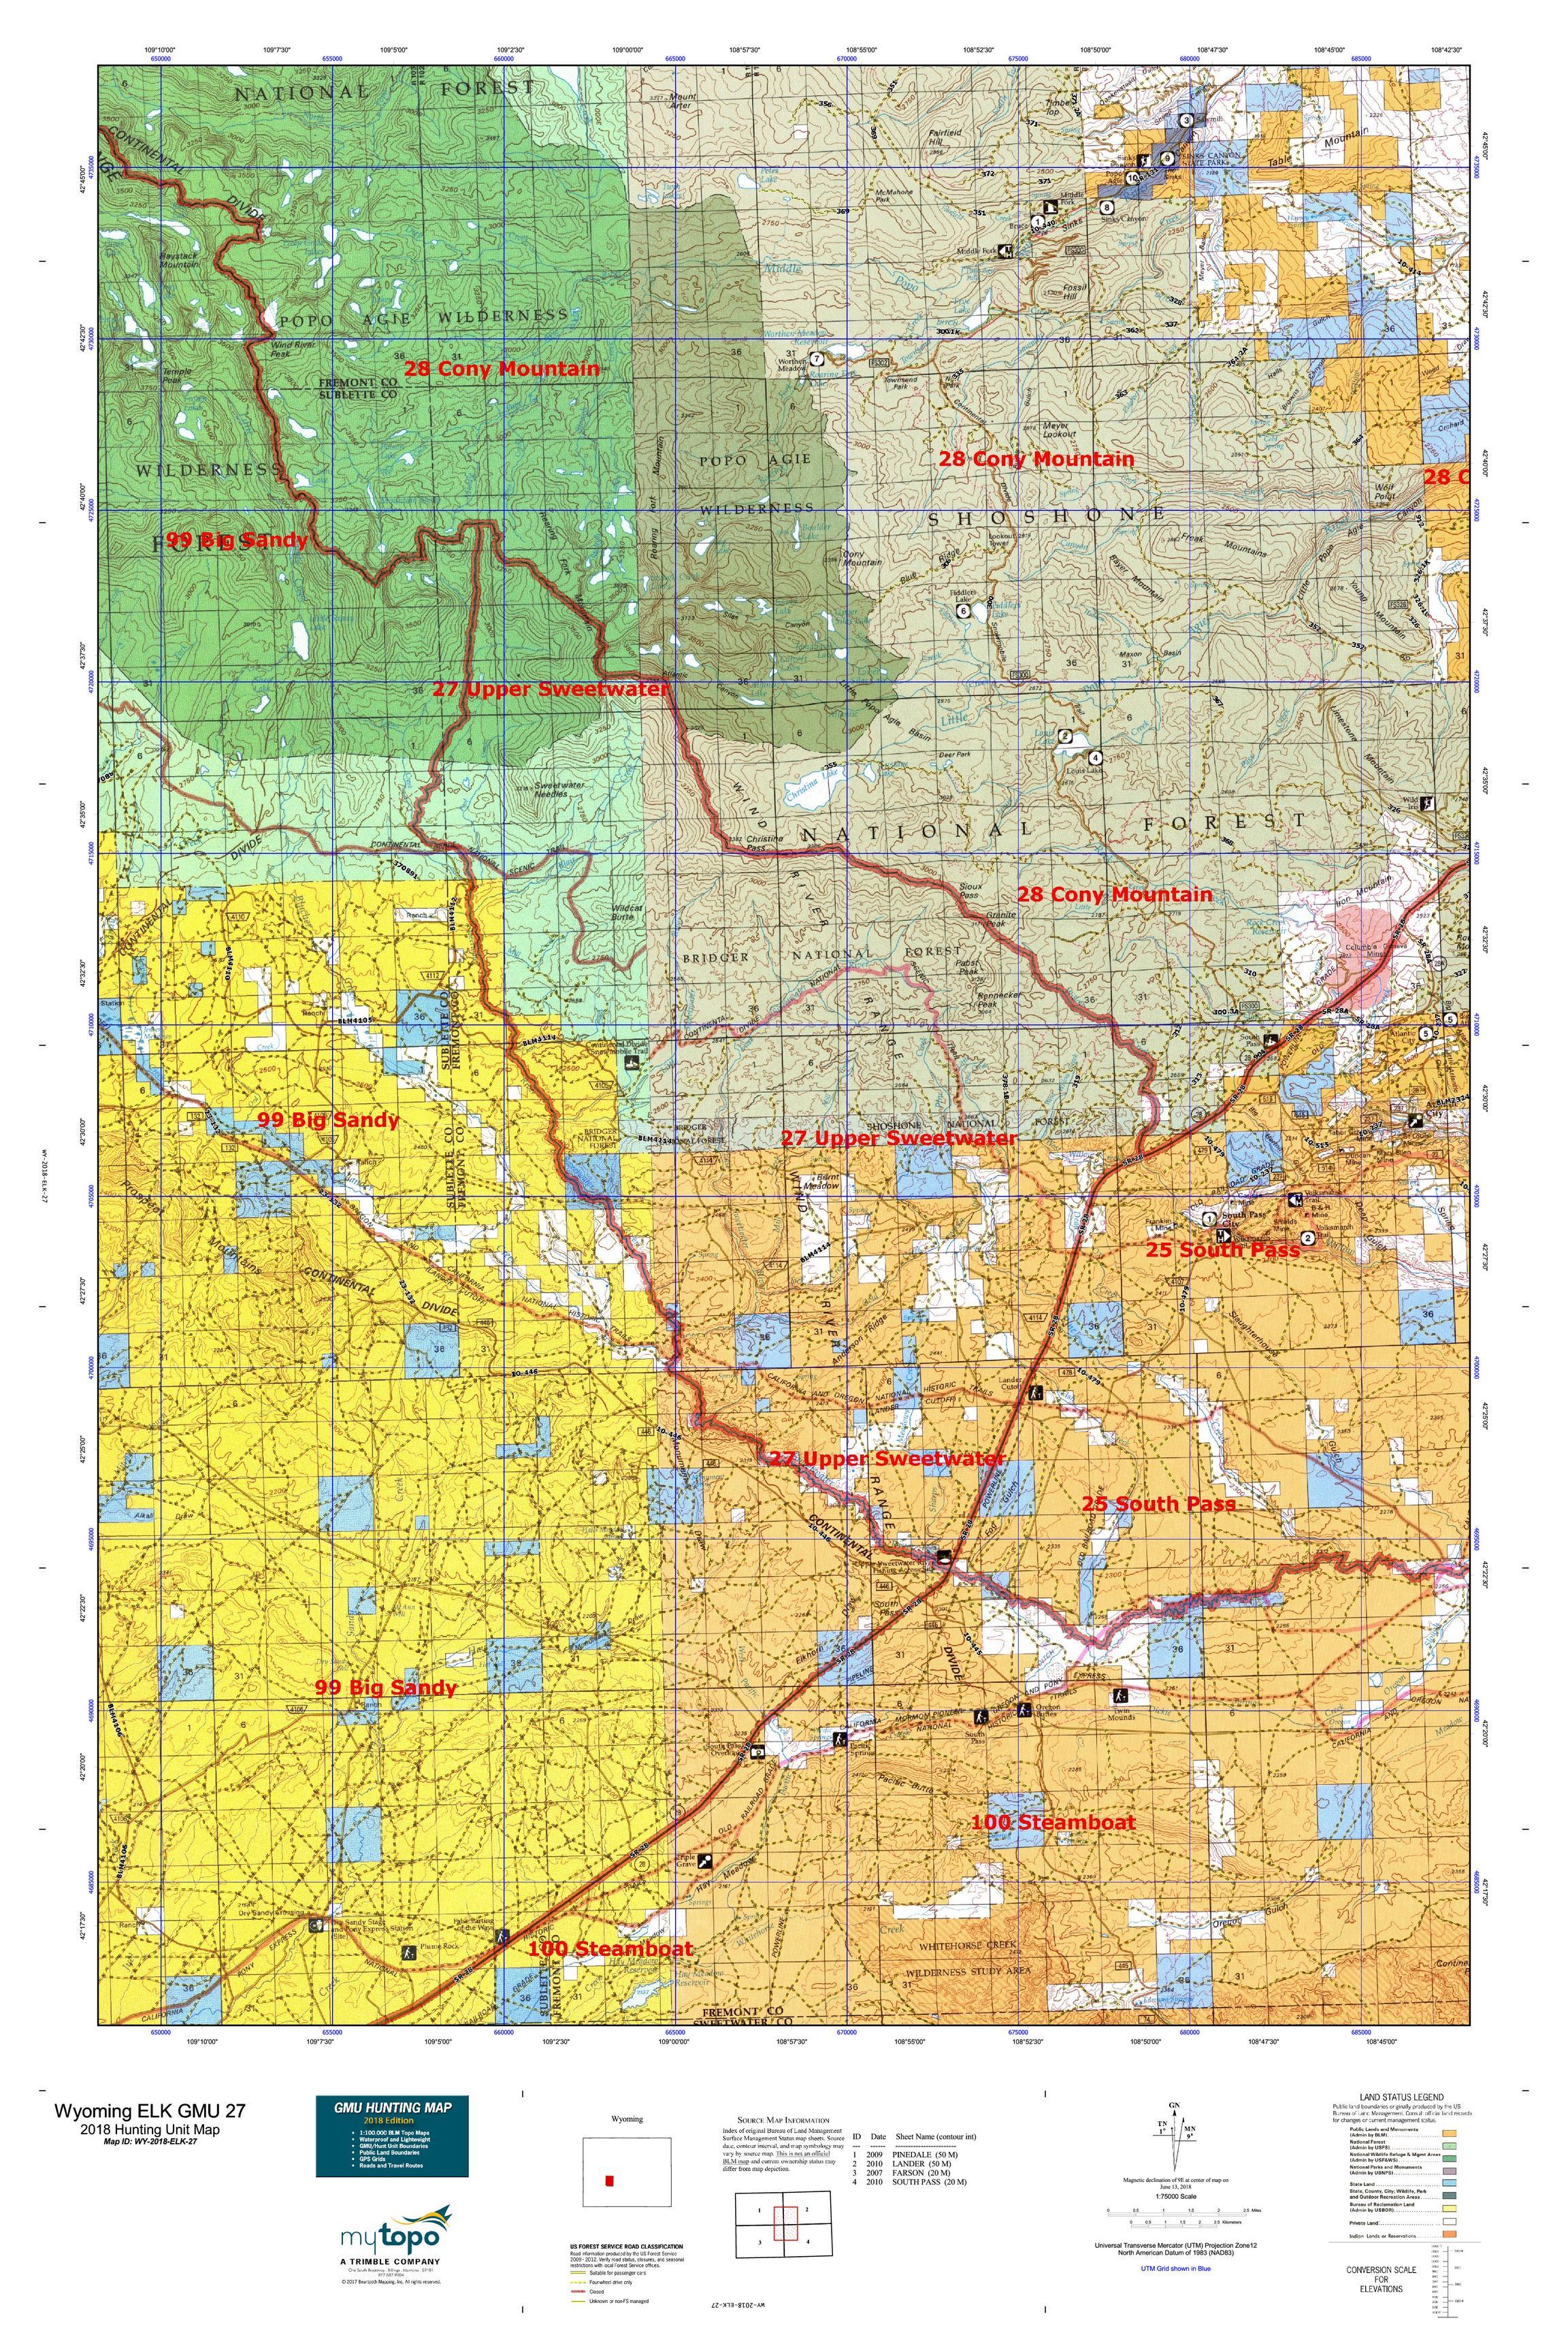 Wyoming Elk Gmu 27 Map Mytopo